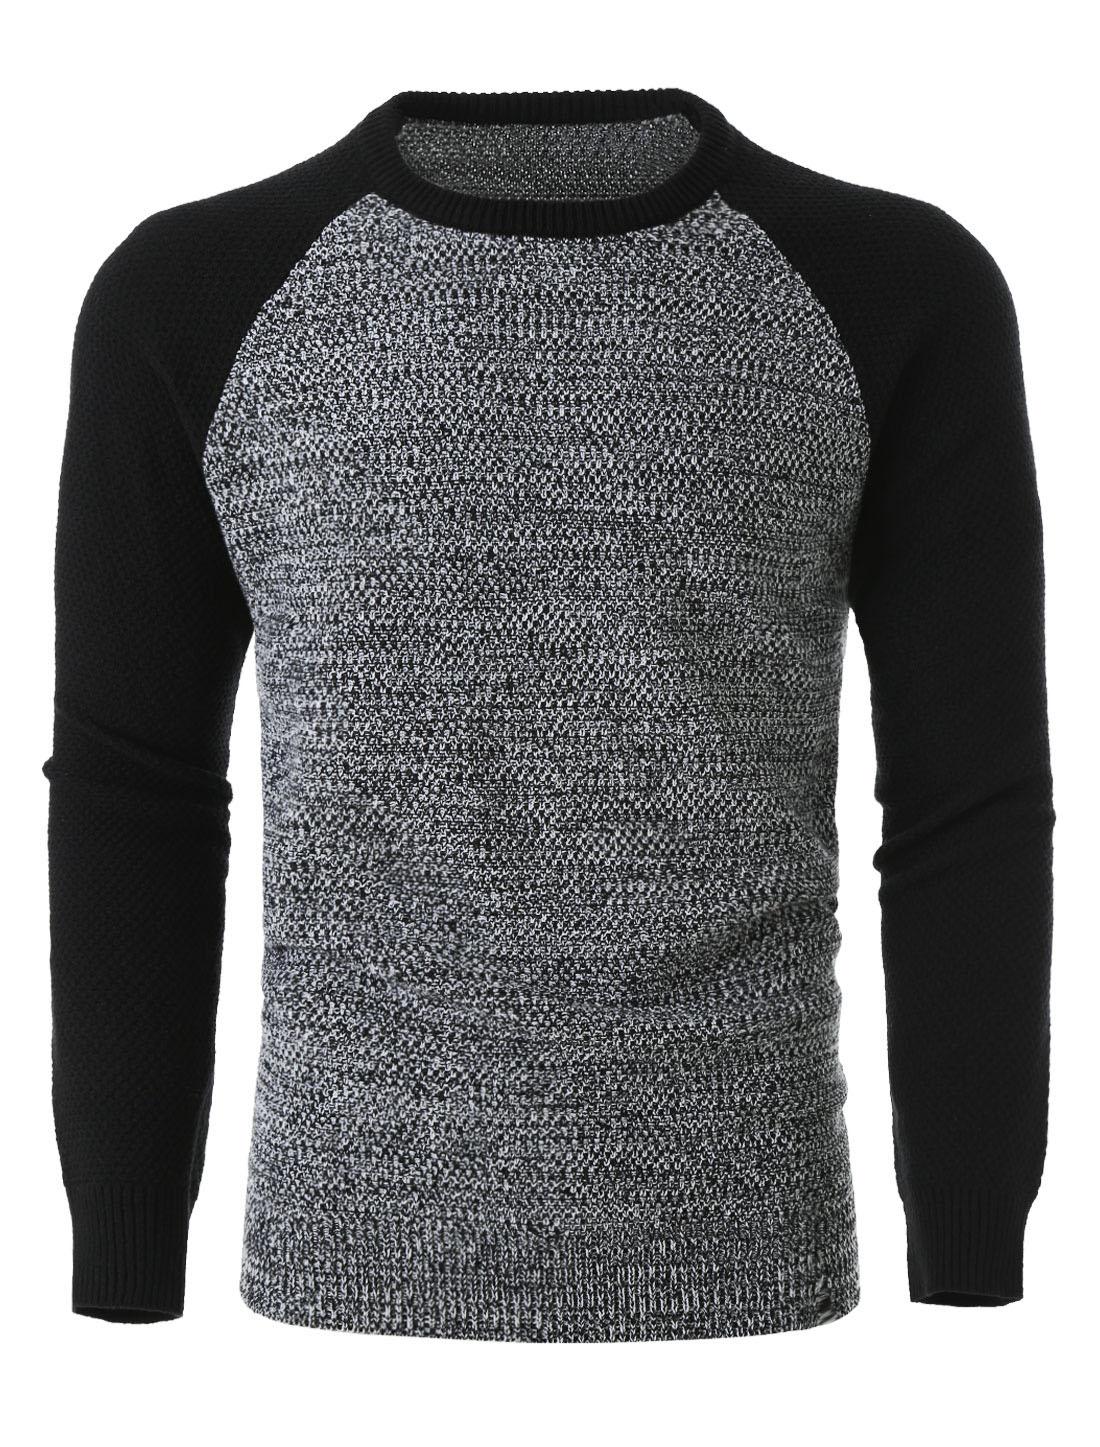 Men Lightweight Color Block Long Sleeve Crewneck Pullover Knit Sweater Grey L